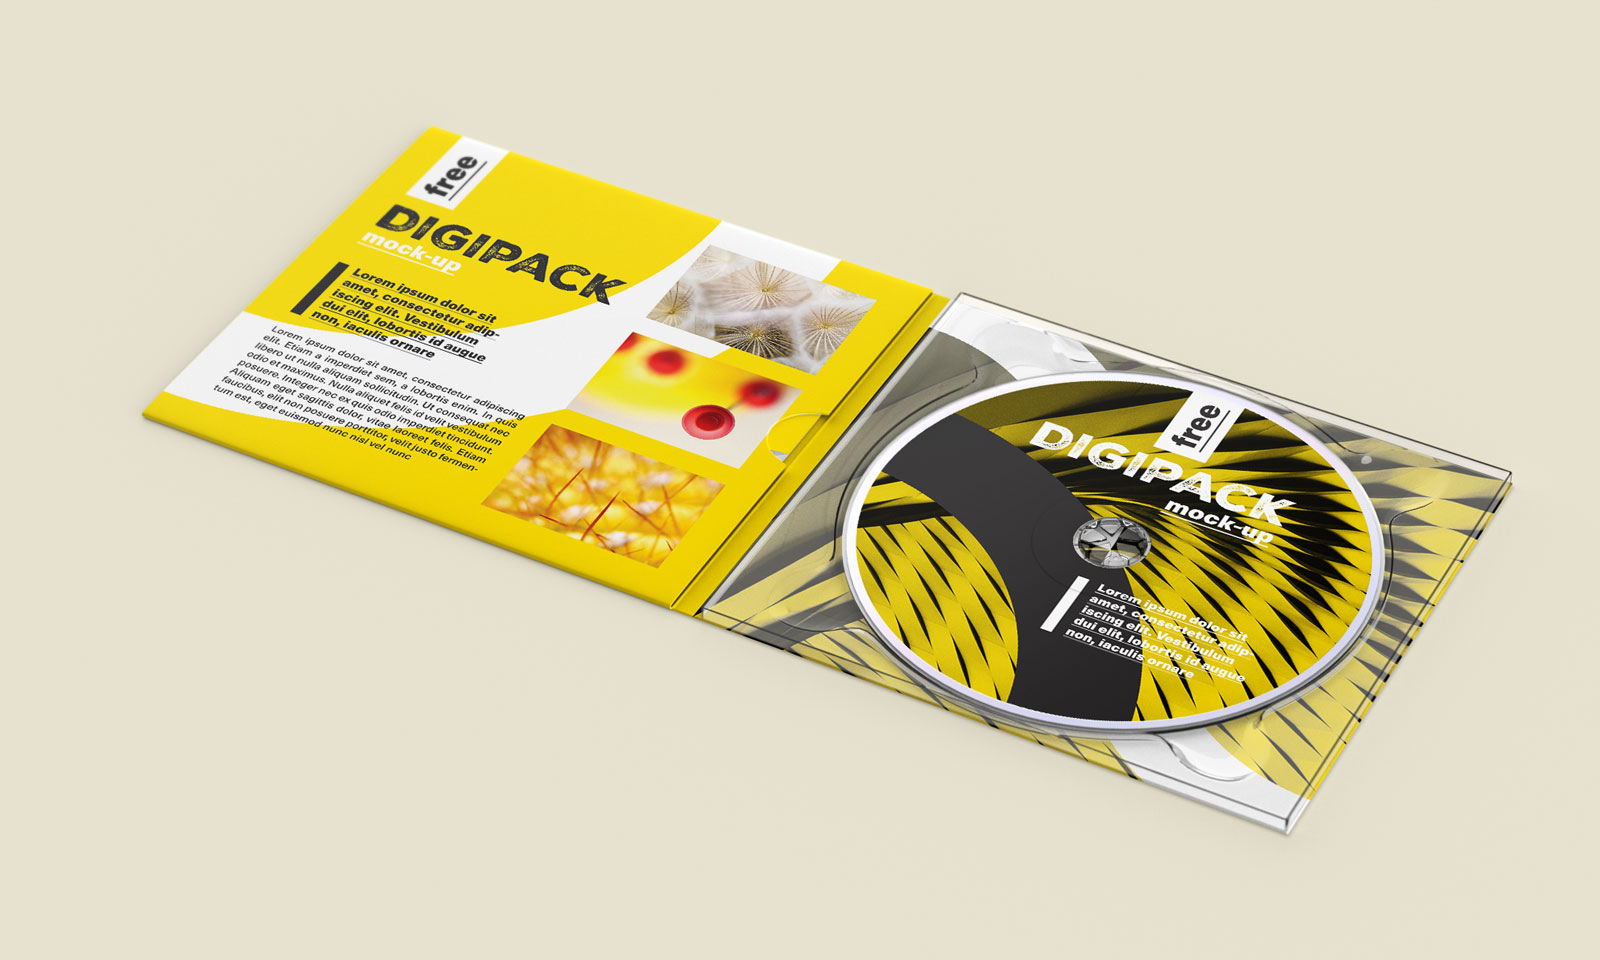 Free-CD-Disc-DVD-Case-Digipack-Mockup-PSD-5